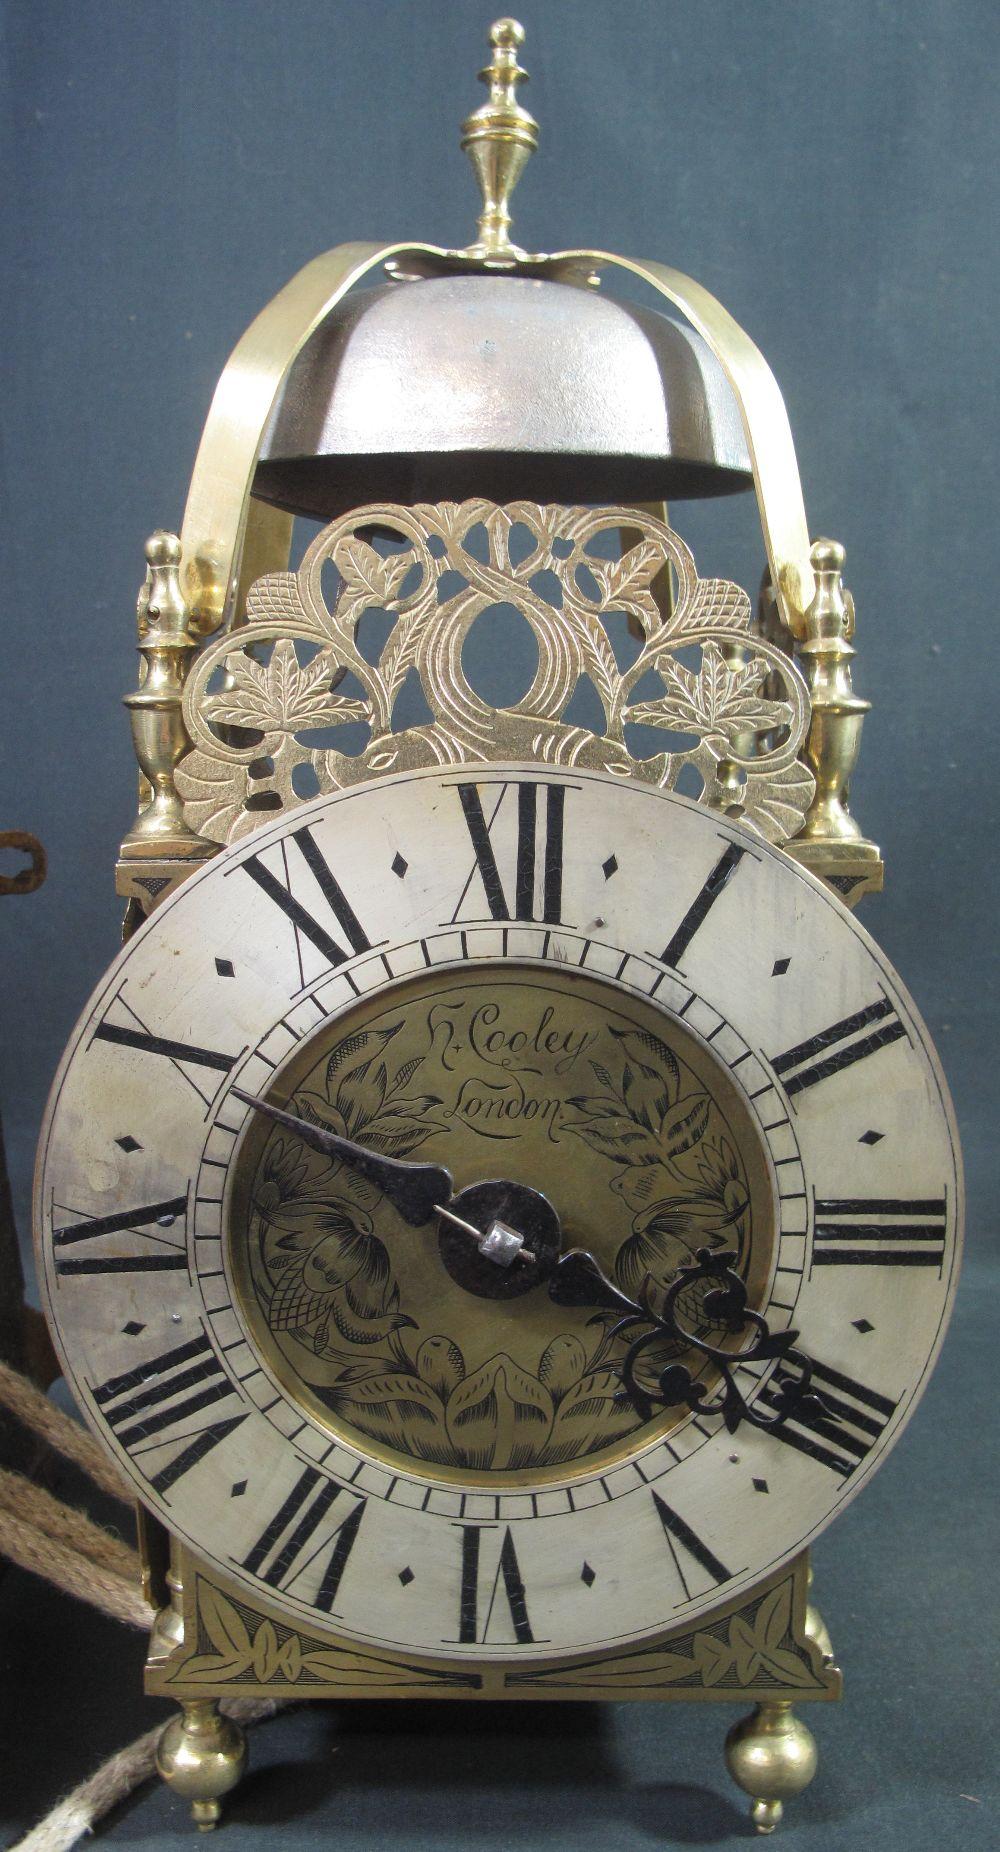 17TH CENTURY STYLE BRASS LANTERN CLOCK t